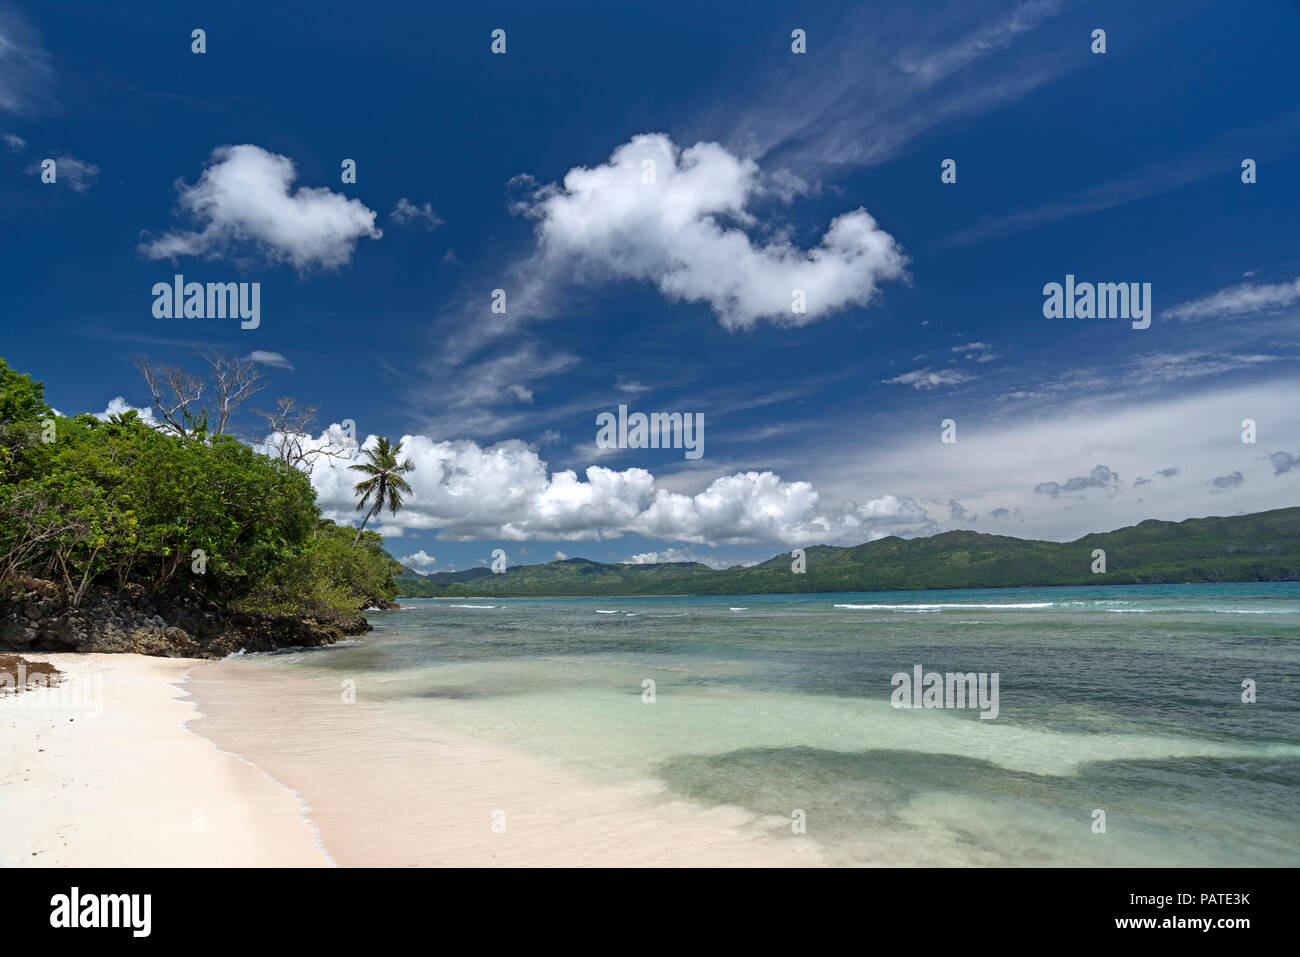 Beautiful Tropical Caribbean beach 'Playita' in the Dominican Republic - Stock Image